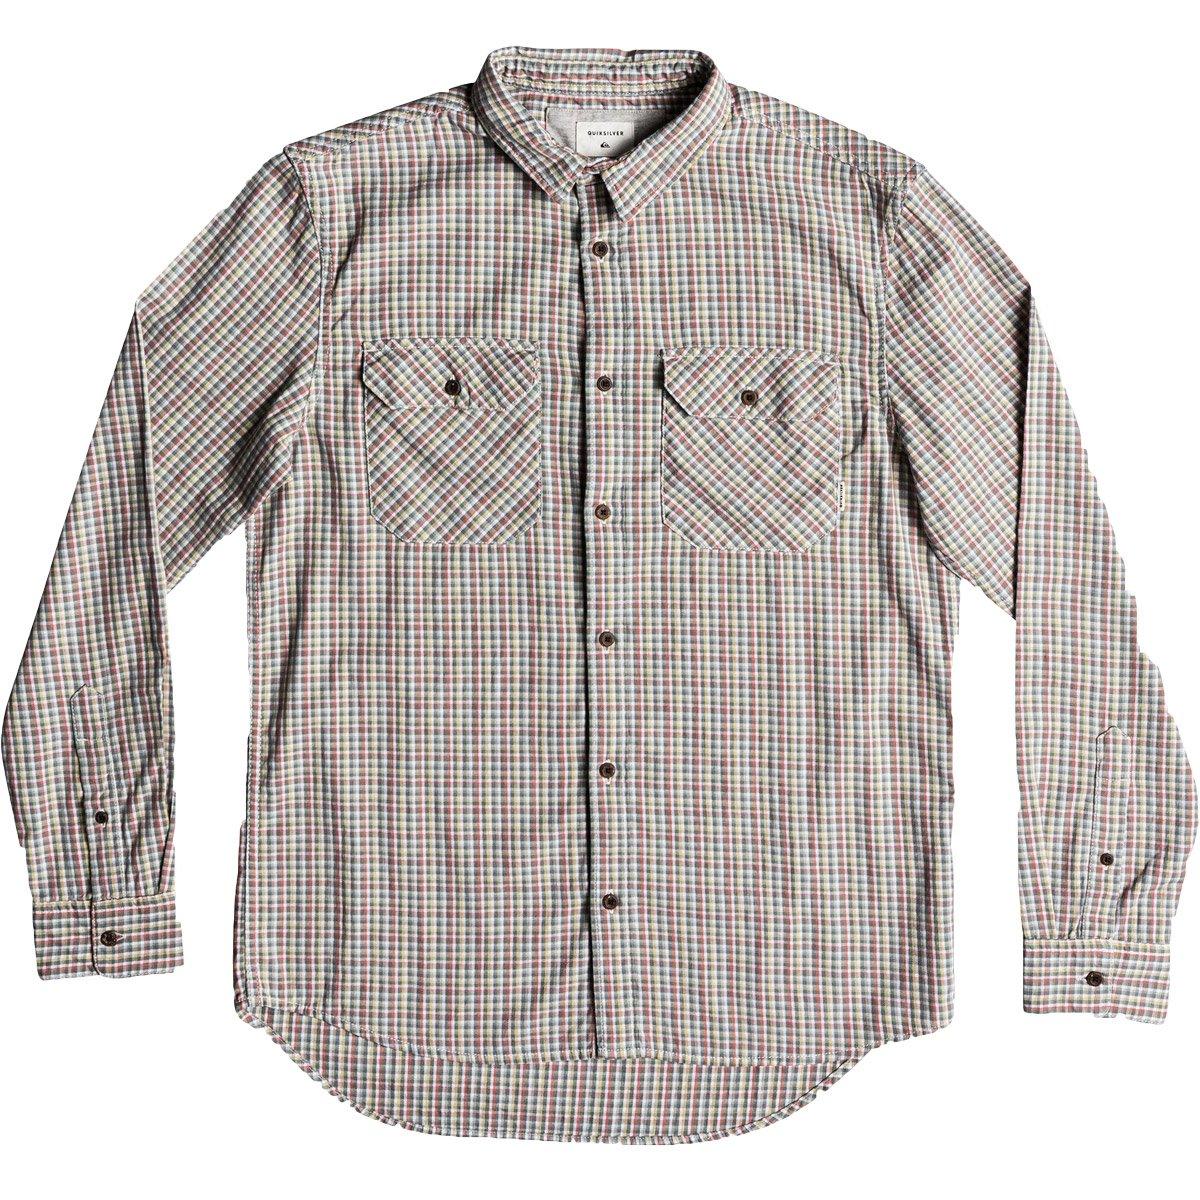 Quiksilver Men's Fuji View Button Down Flannel Shirt, Dark Forest Fuji View, XL